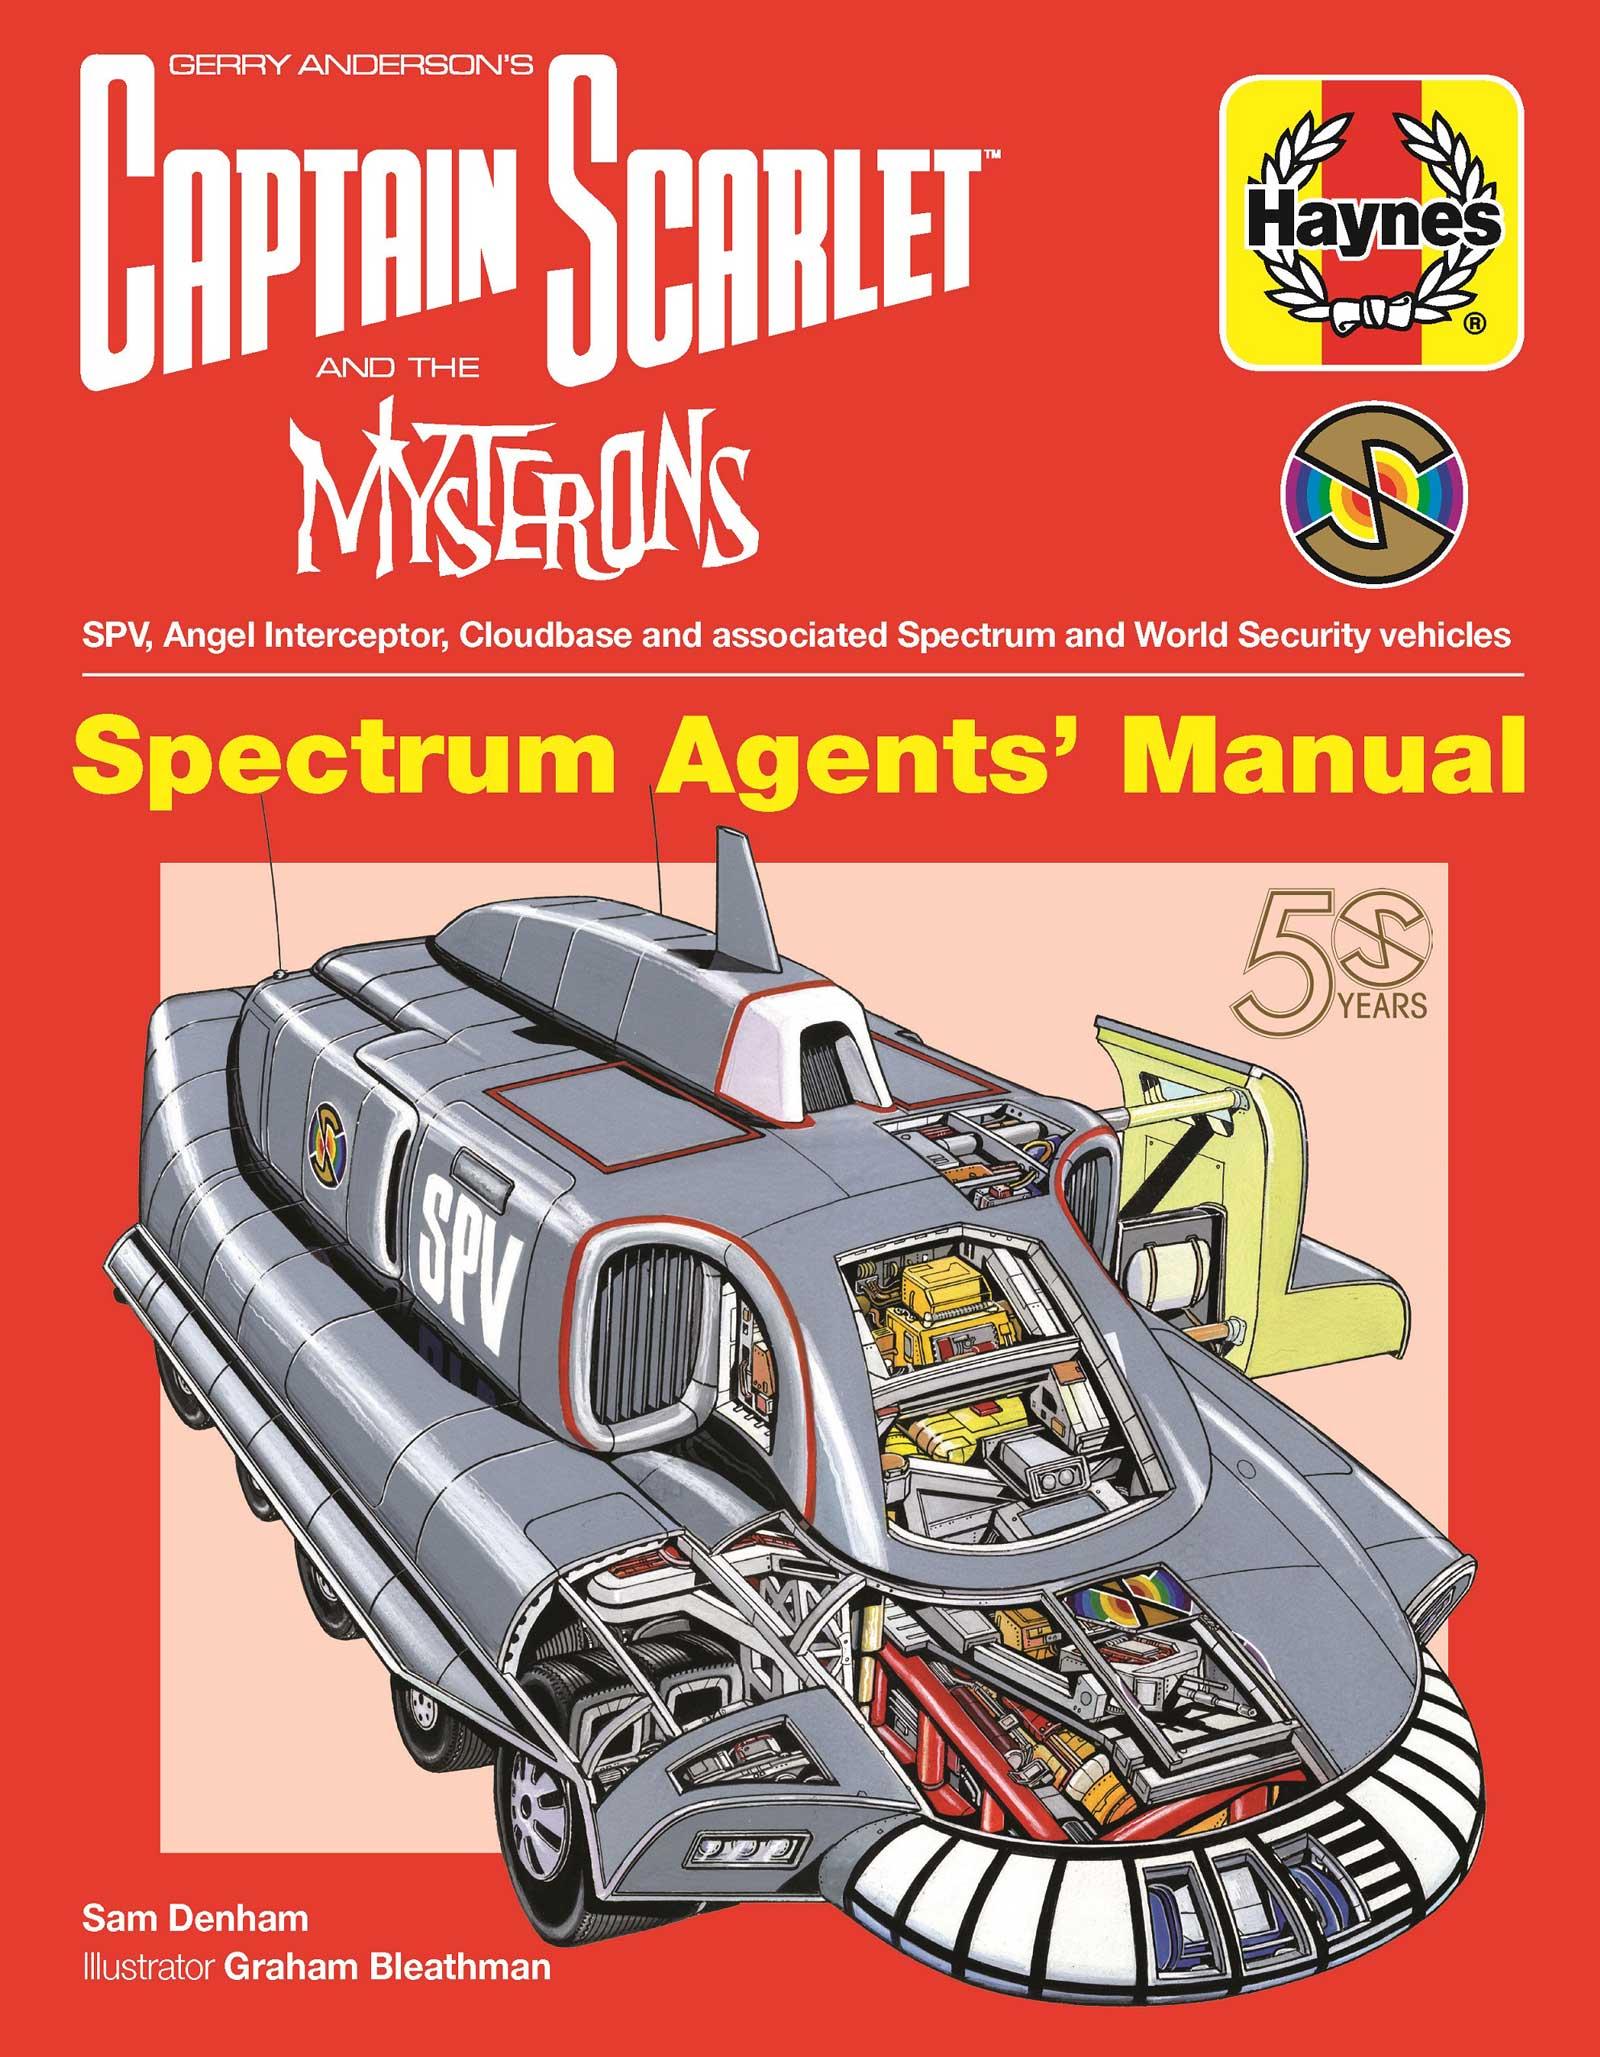 Captain Scarlet - Spectrum Agents' Manual - Cover